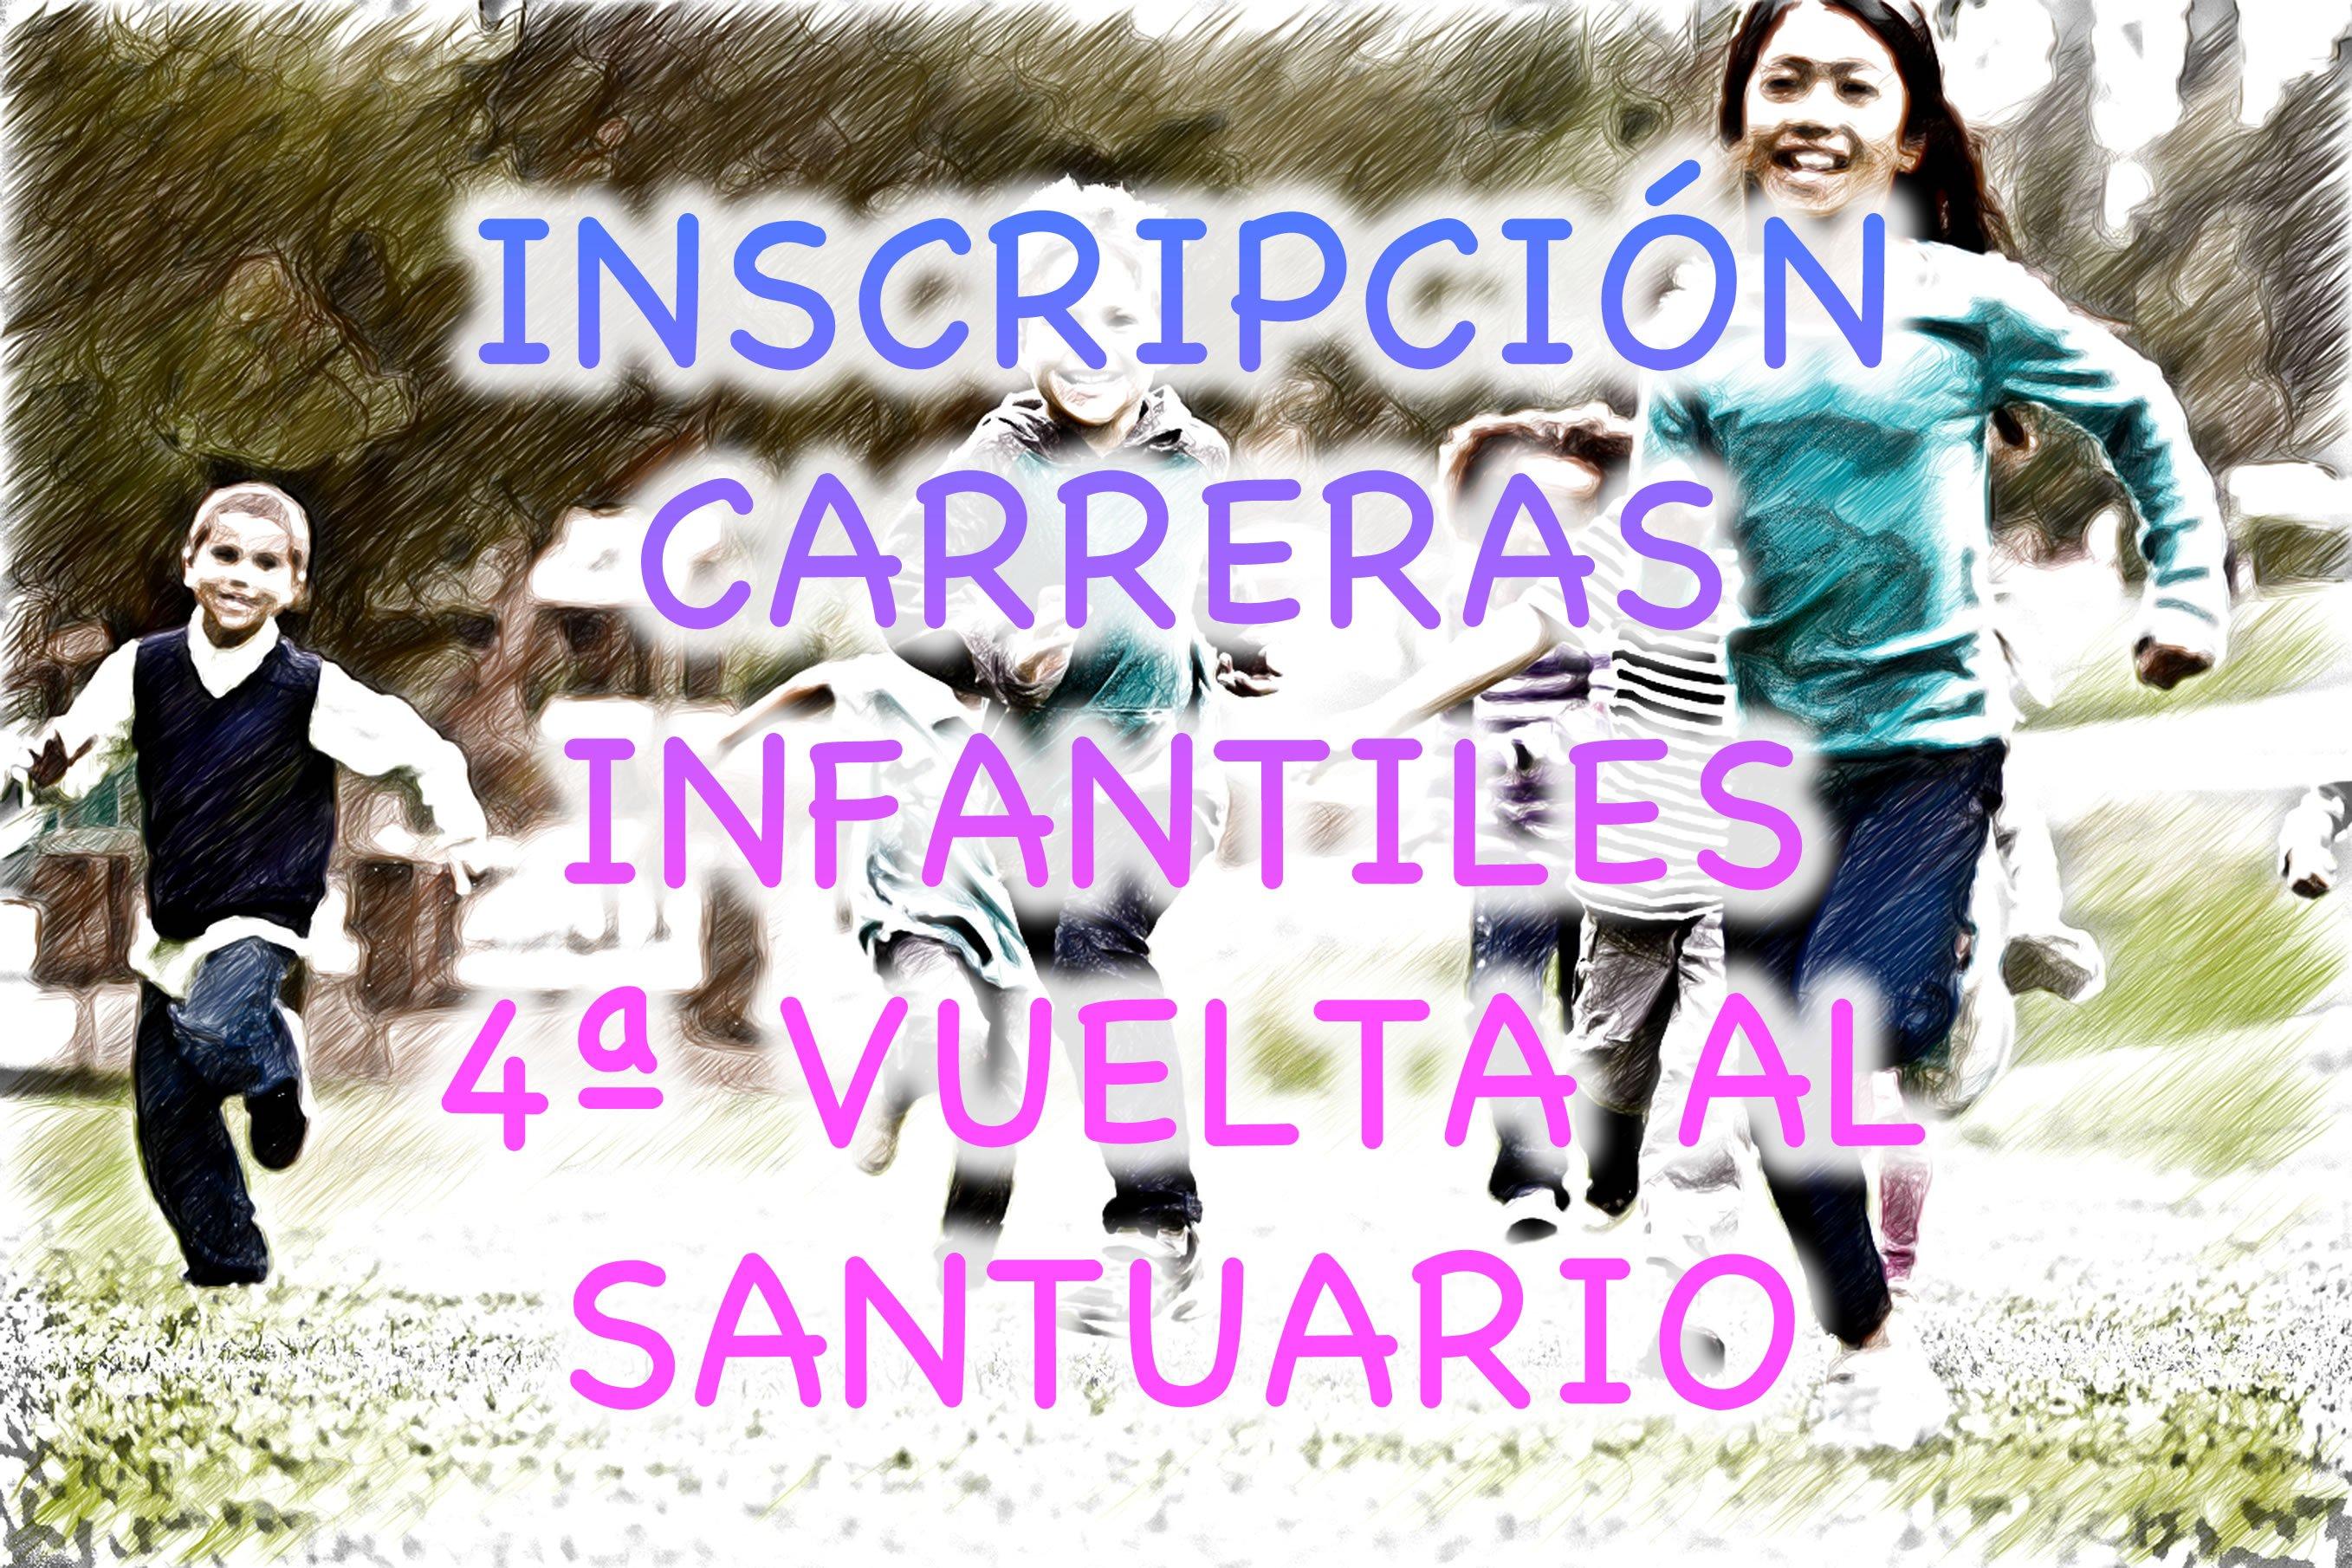 Inscripciones Carreras Infantiles 4ª Vuelta Al Santuario (14K)